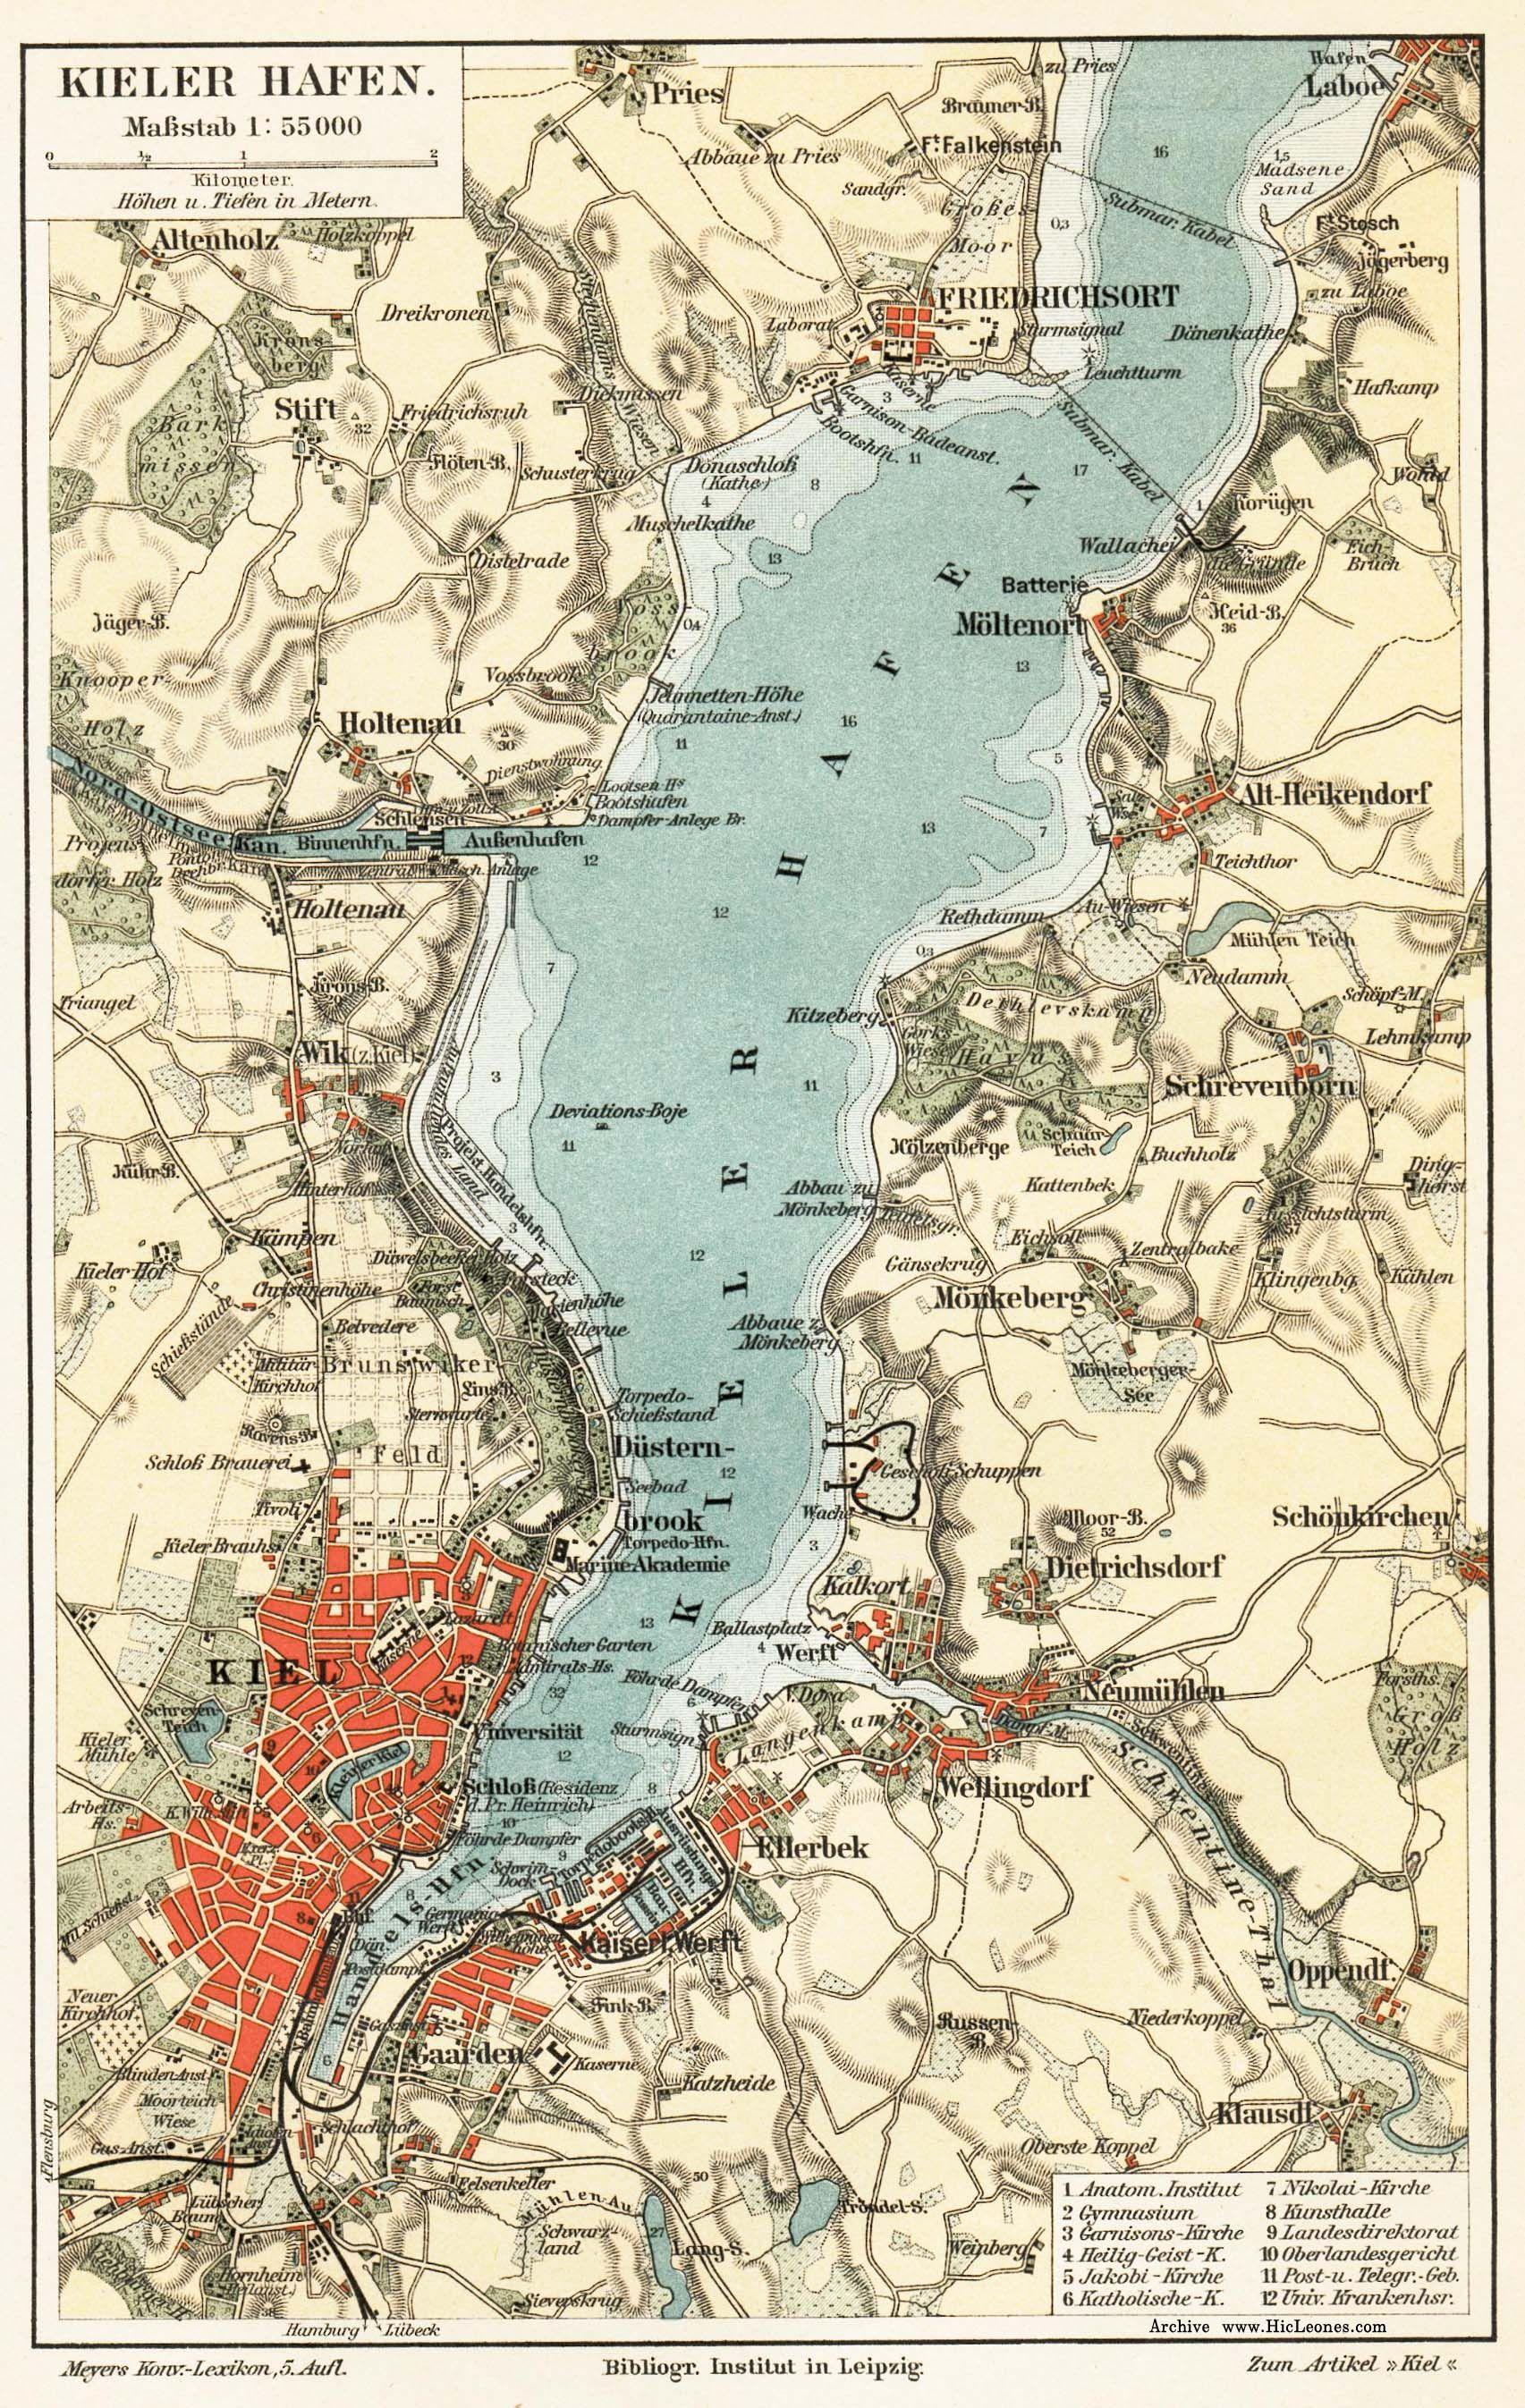 Kieler Bucht Karte.Map Kiel Baltic In 2019 Kiel Kieler Förde Und Hafen